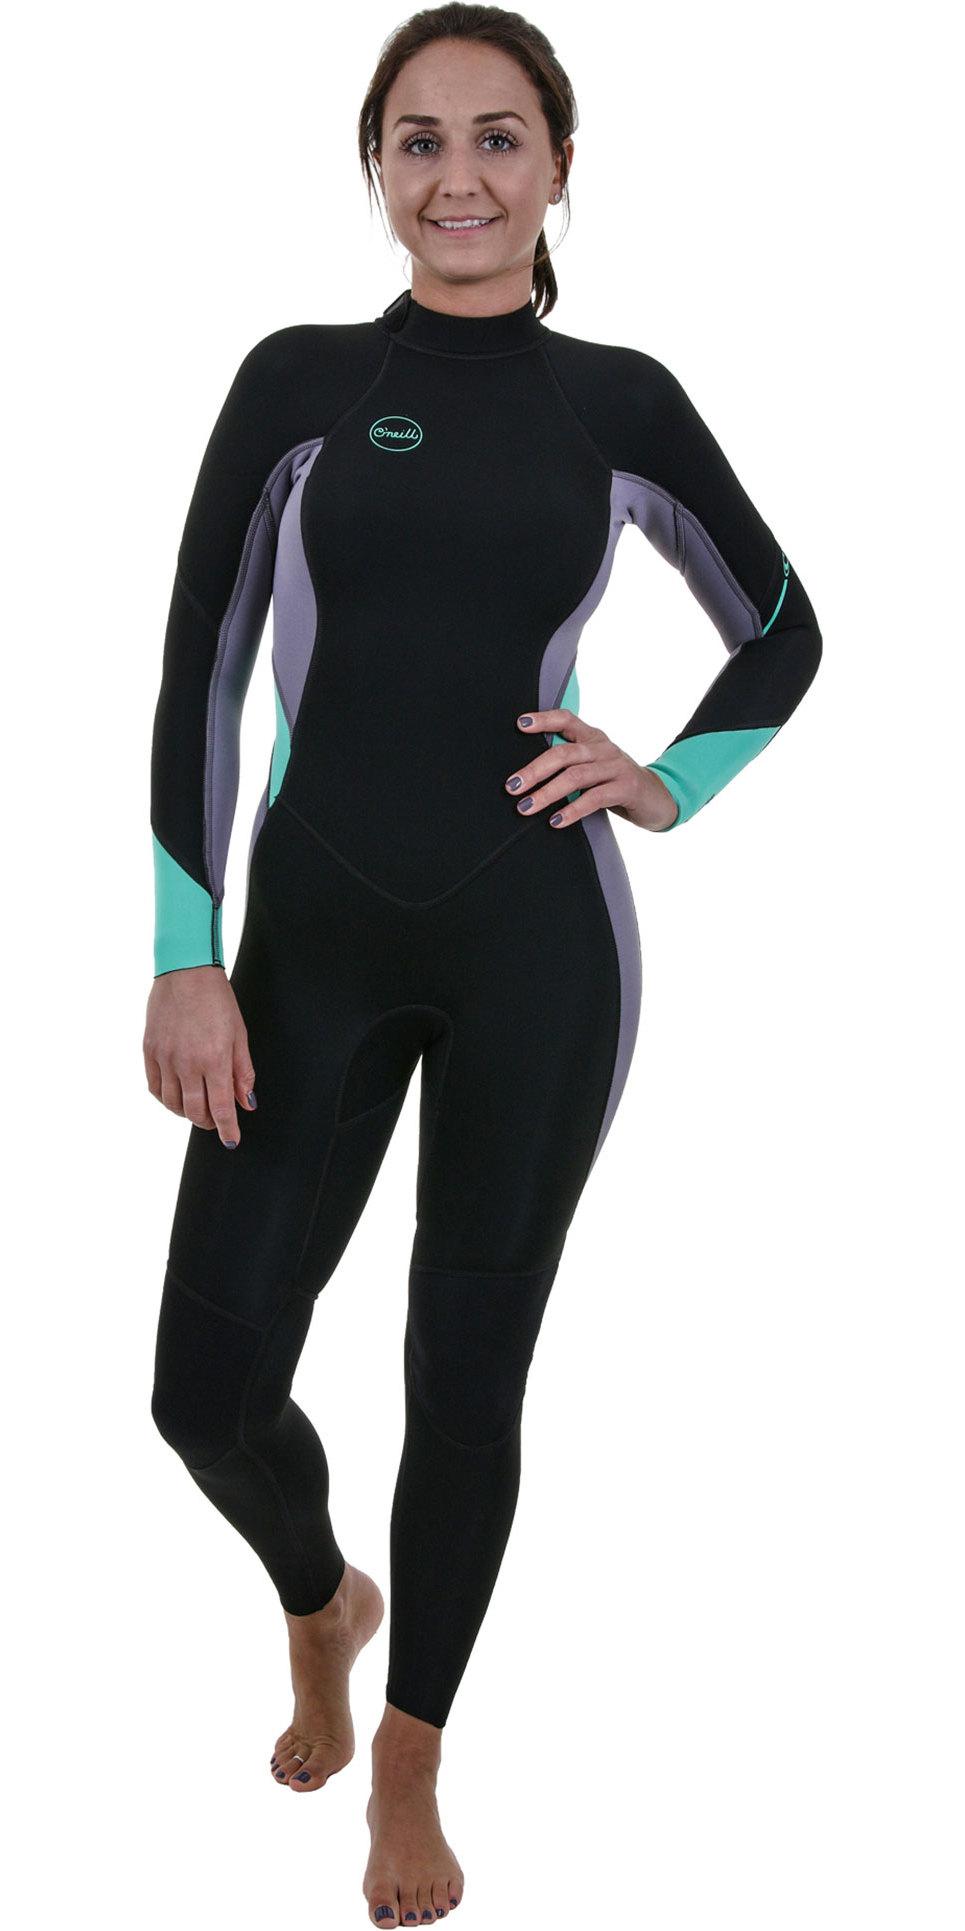 2019 O'Neill Womens Bahia 3/2mm Back Zip Wetsuit Black / Dusk 5292